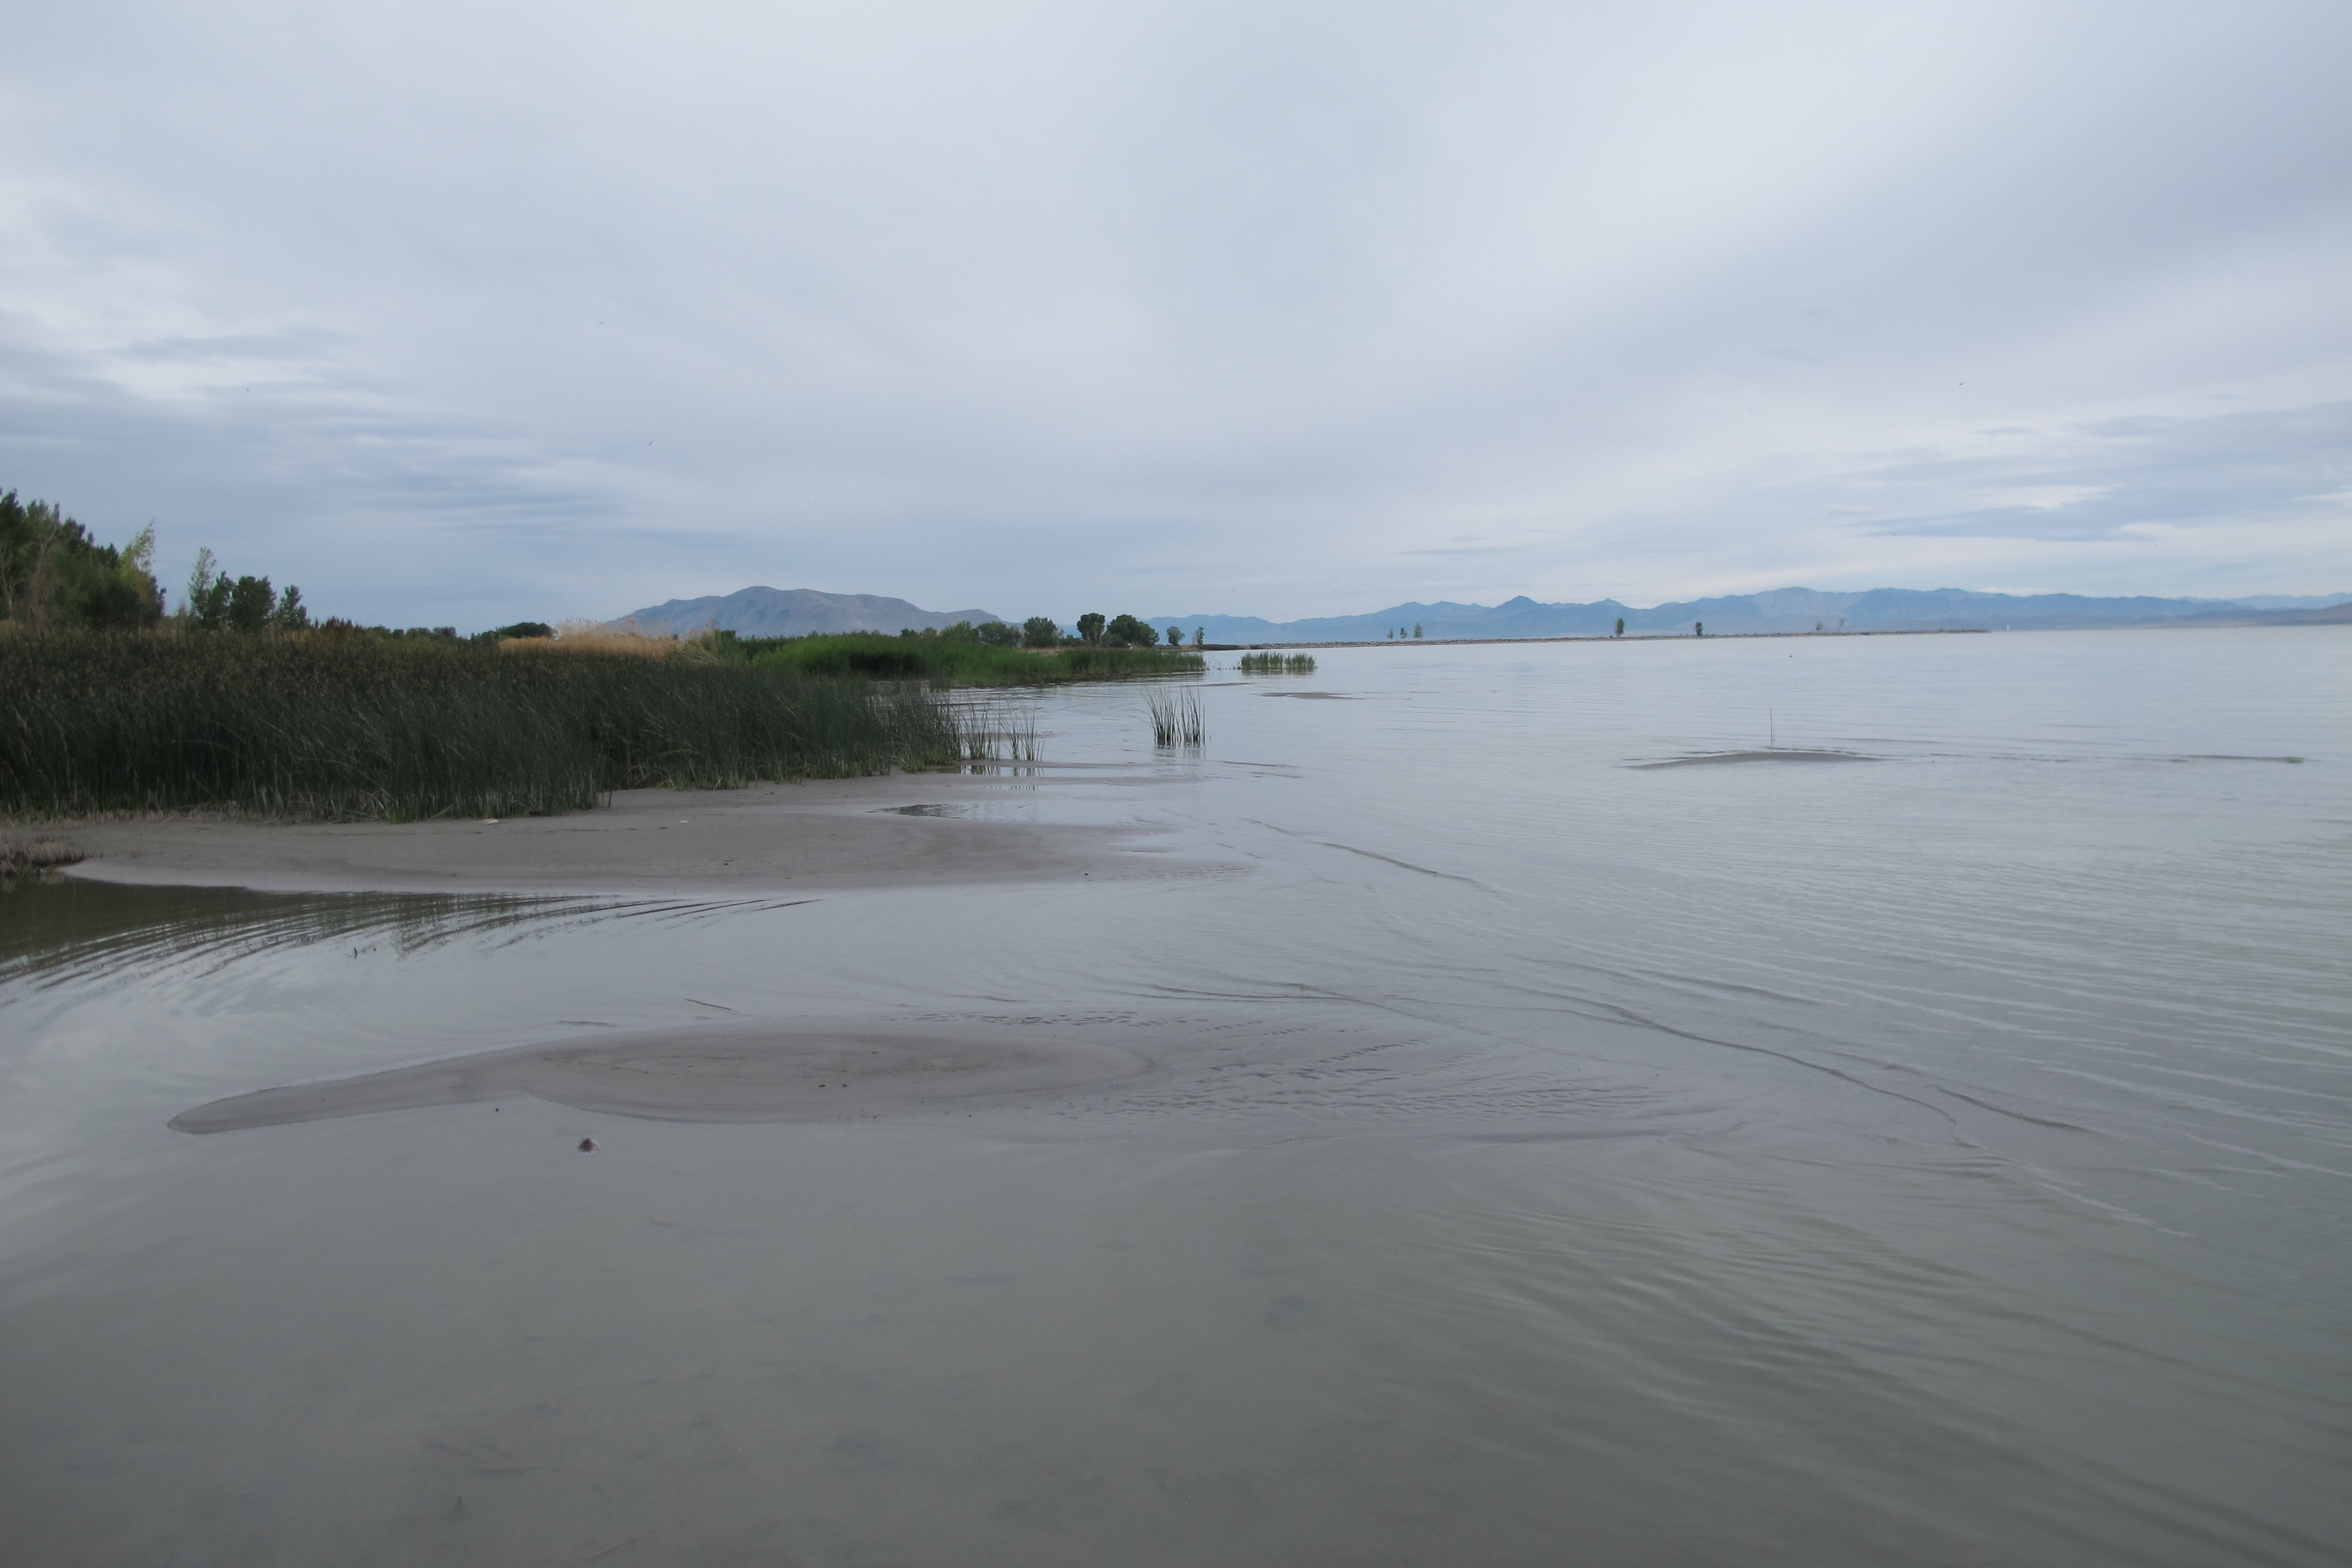 LPRD beach veg and shallow later water 1